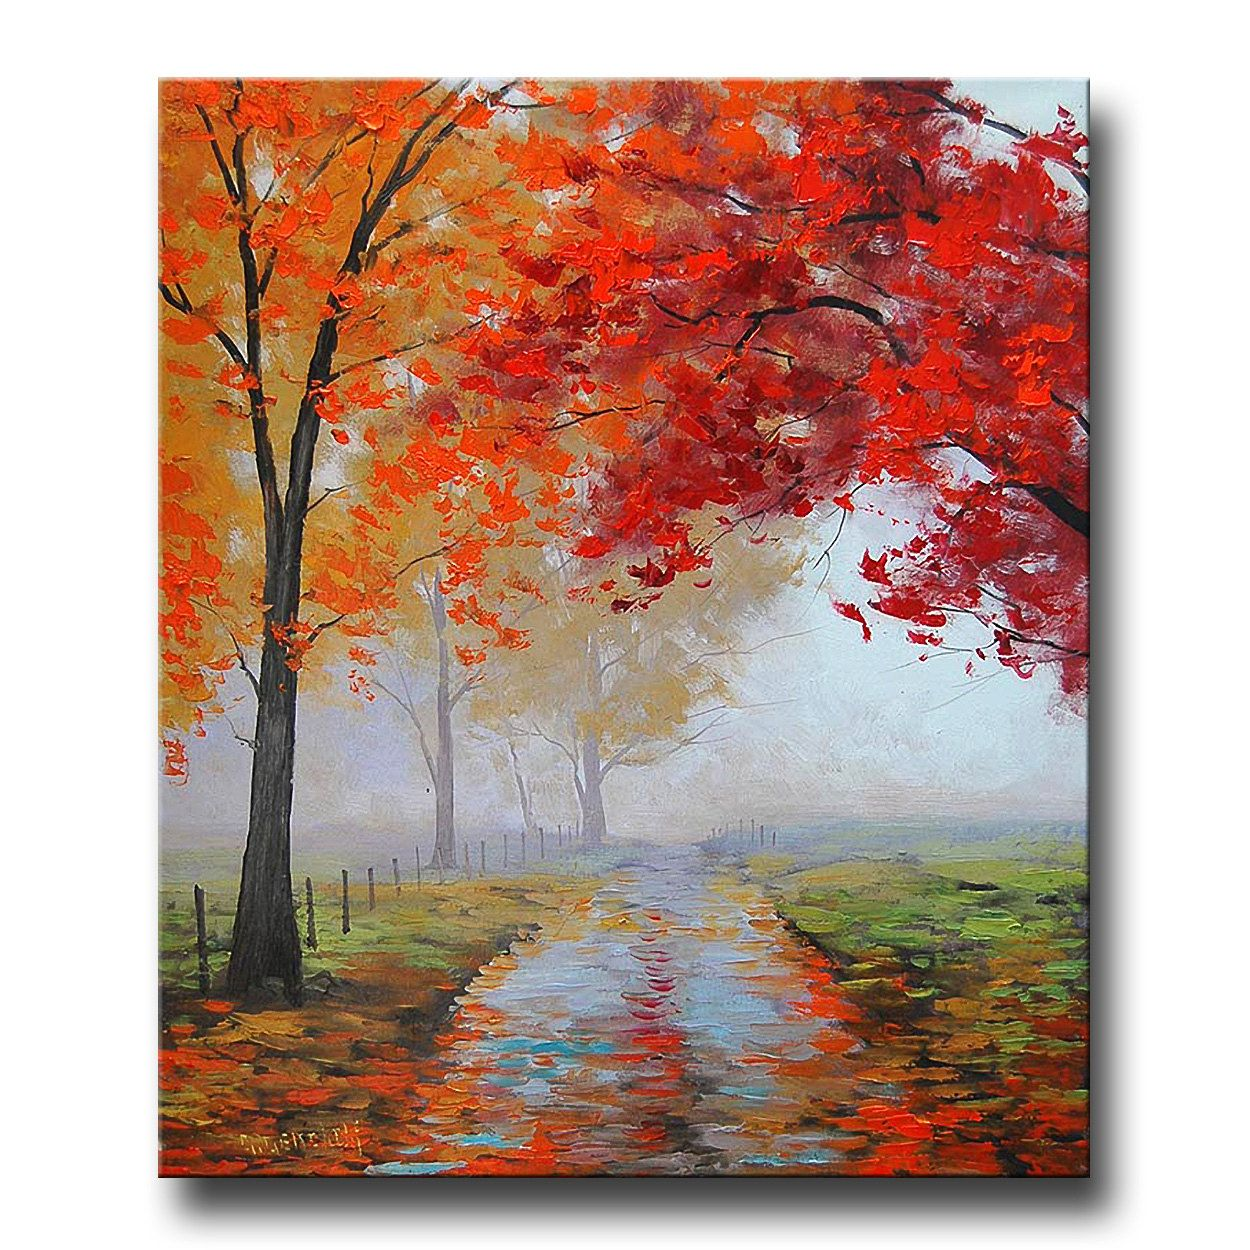 Realistic Oil Painting Fall Trees Impressionism Misty Road Art Deco Pinturas Hermosas Pinturas Abstractas Pinturas